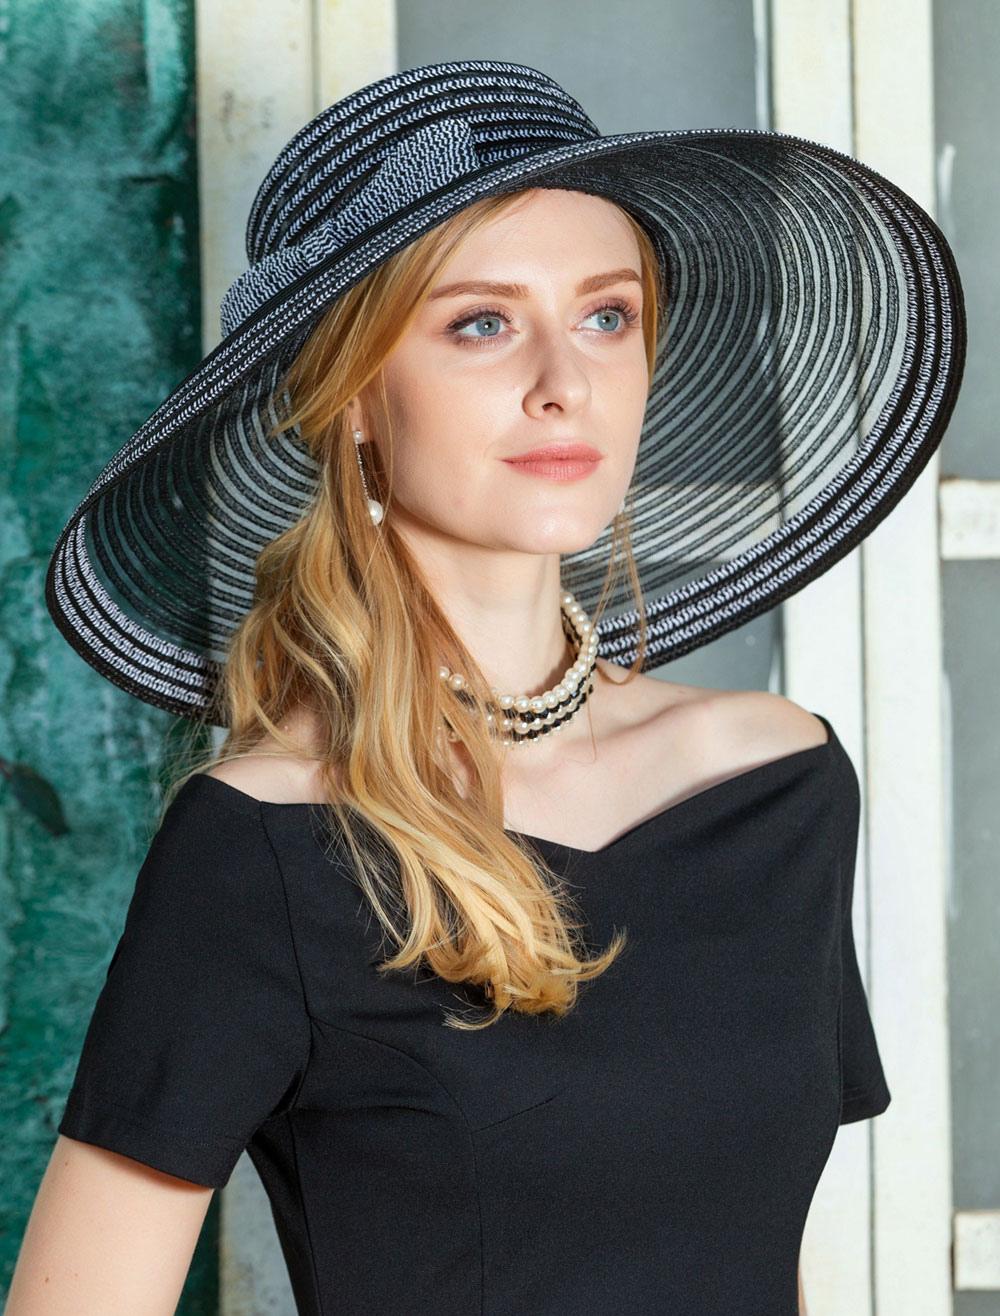 Buy Black Vintage Hat Women Retro Cap Wide Brim Costume Hair Accessories for $28.79 in Milanoo store